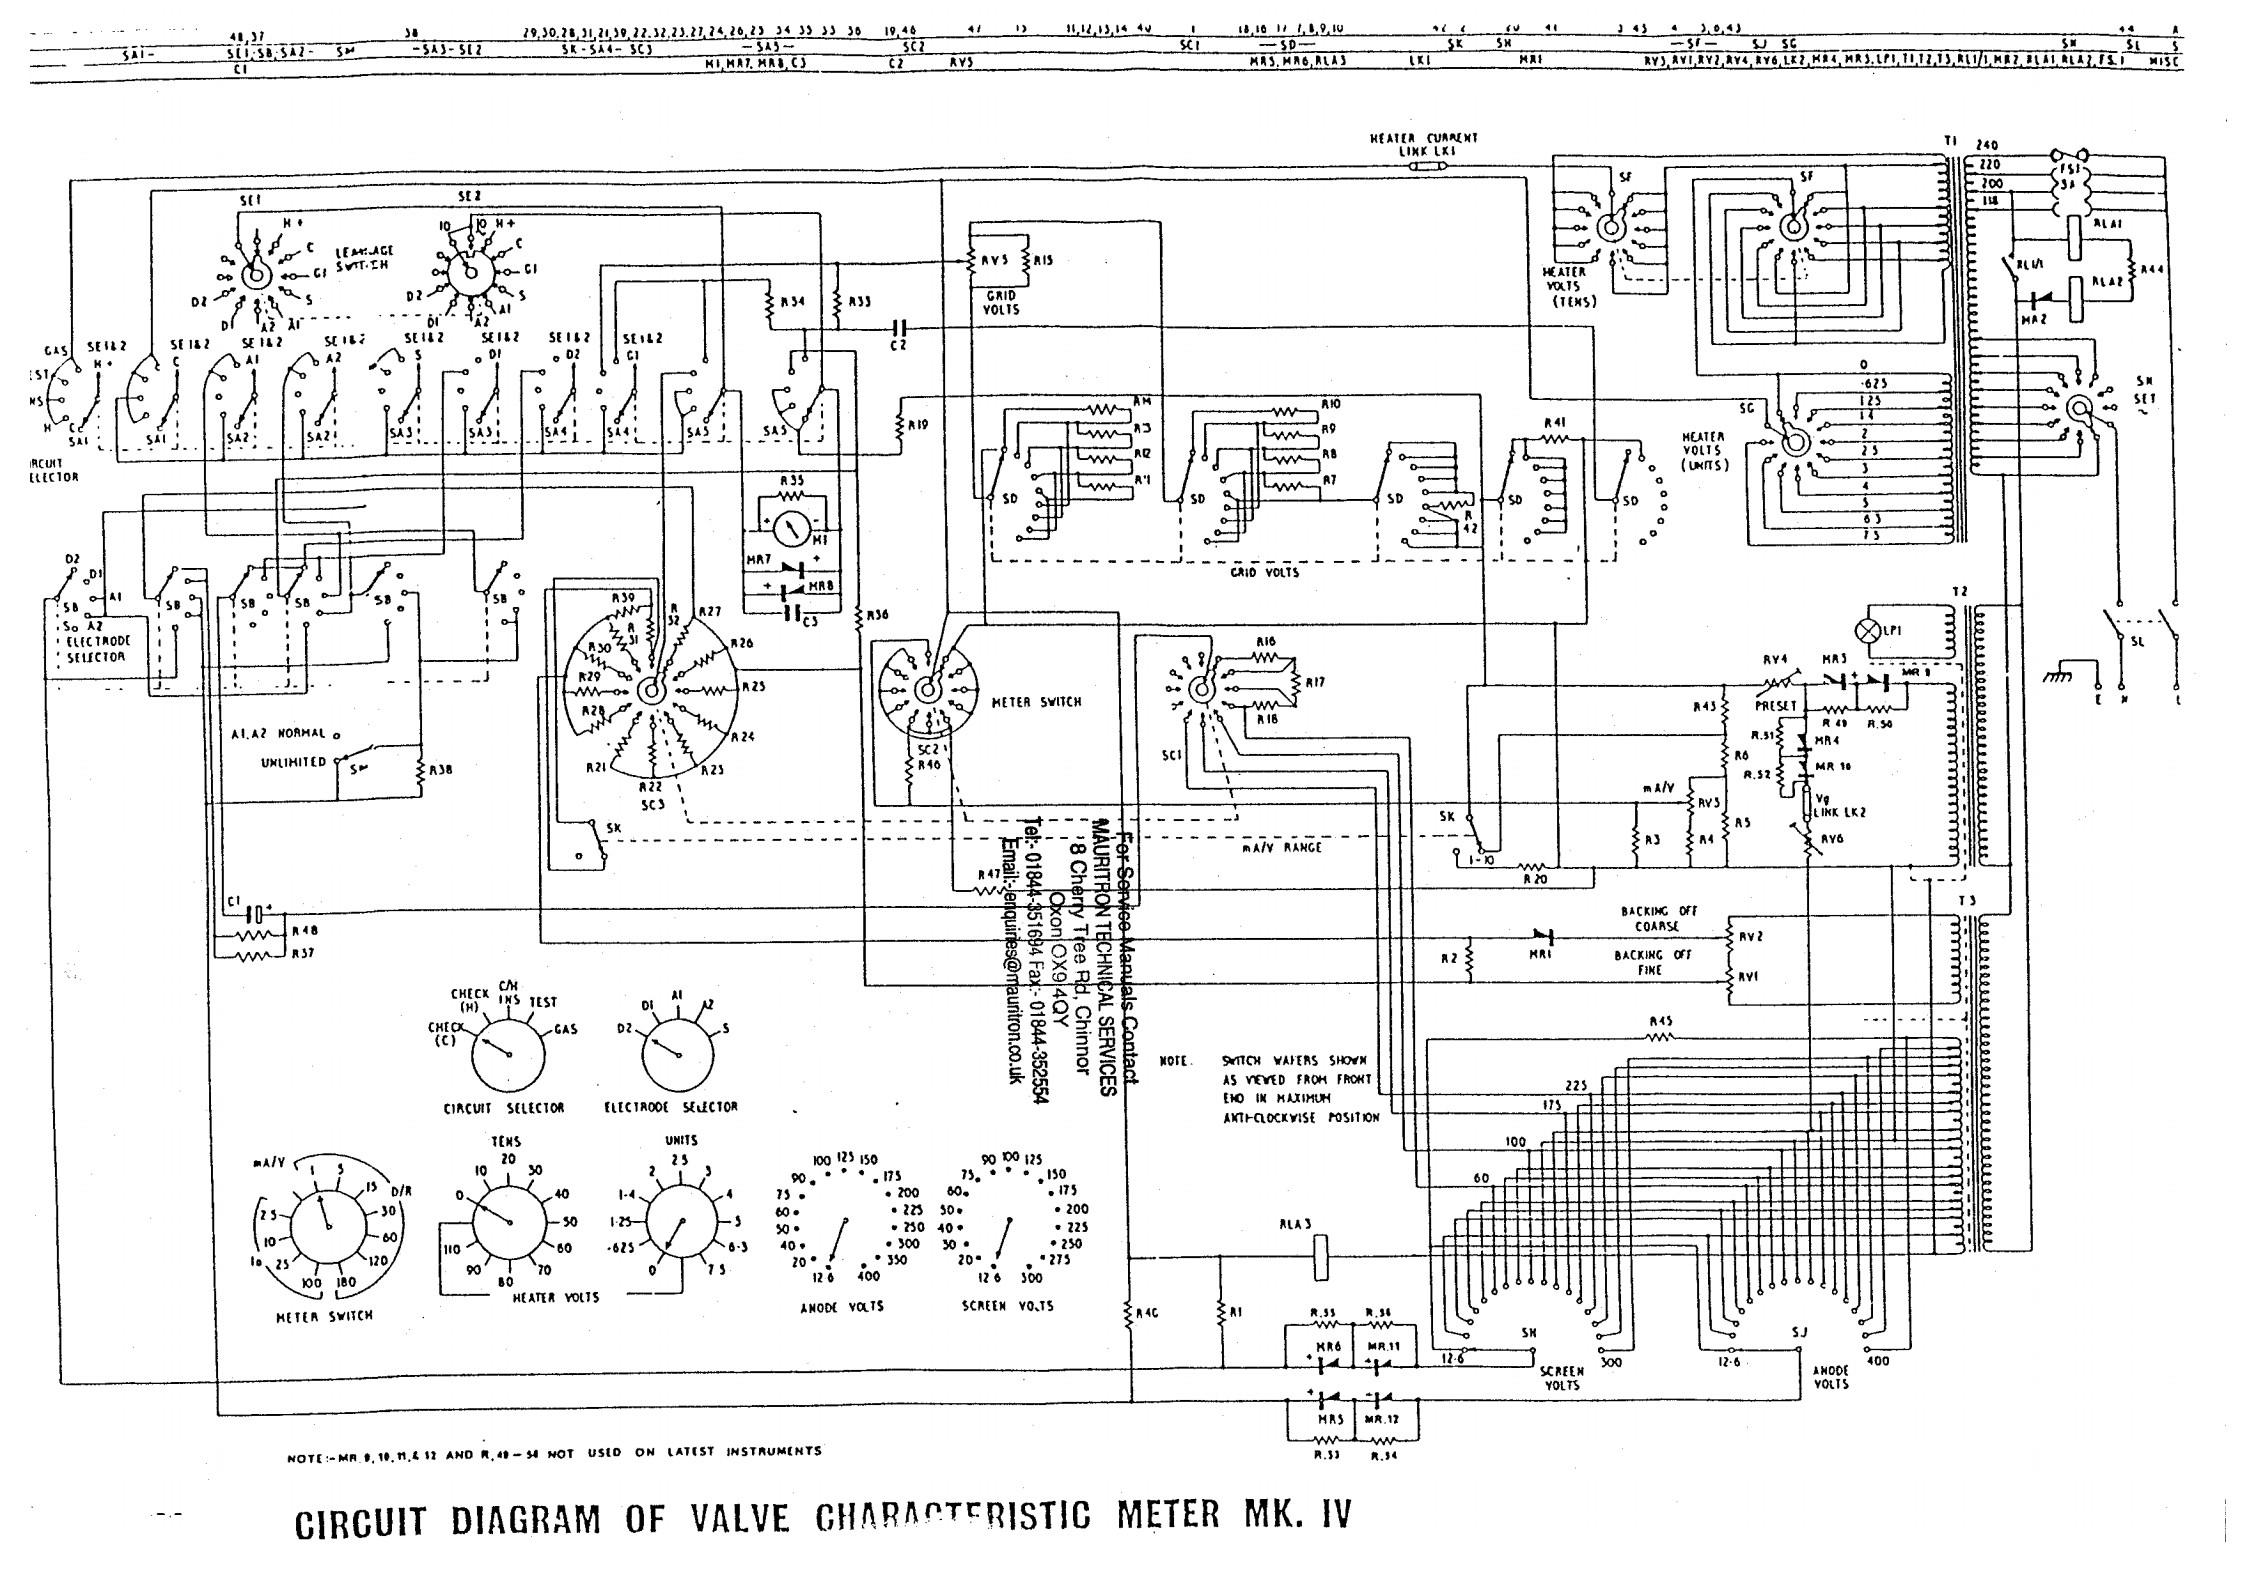 Avo 8 Circuit Diagram - Wiring Liry Diagram Experts